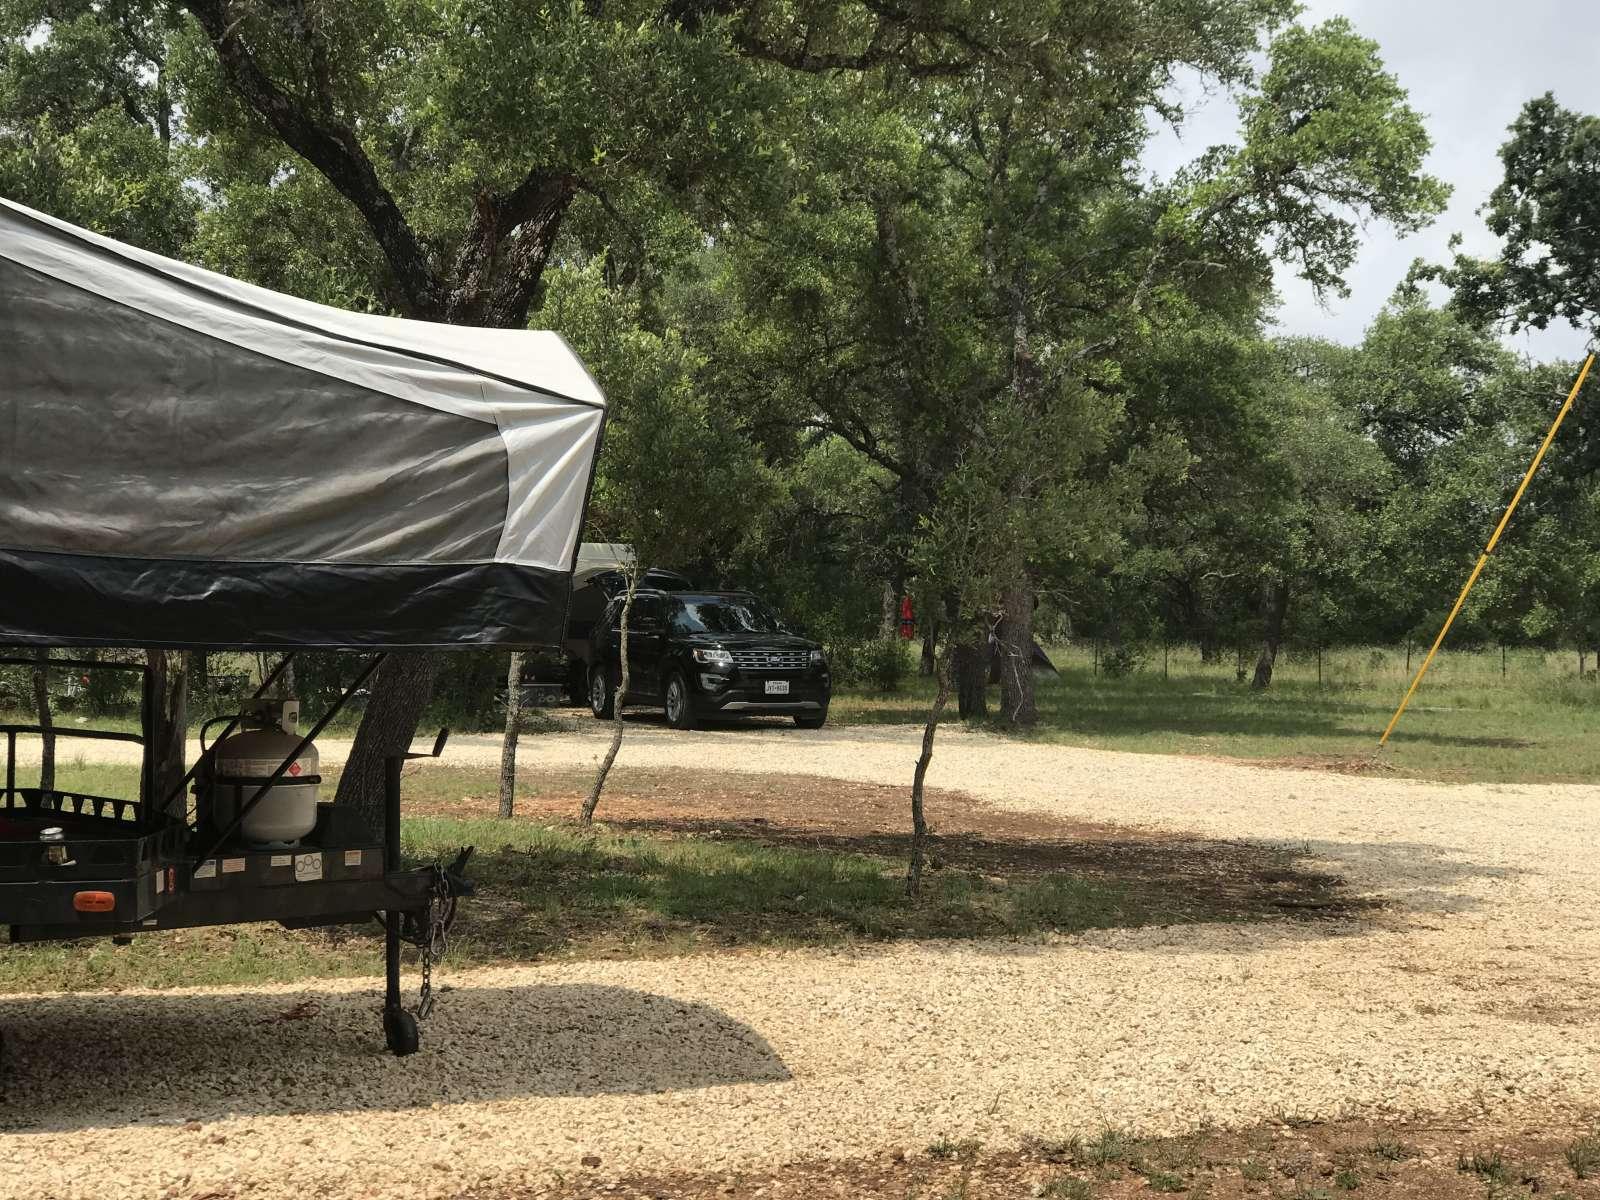 Full hookup Camping i San Diego